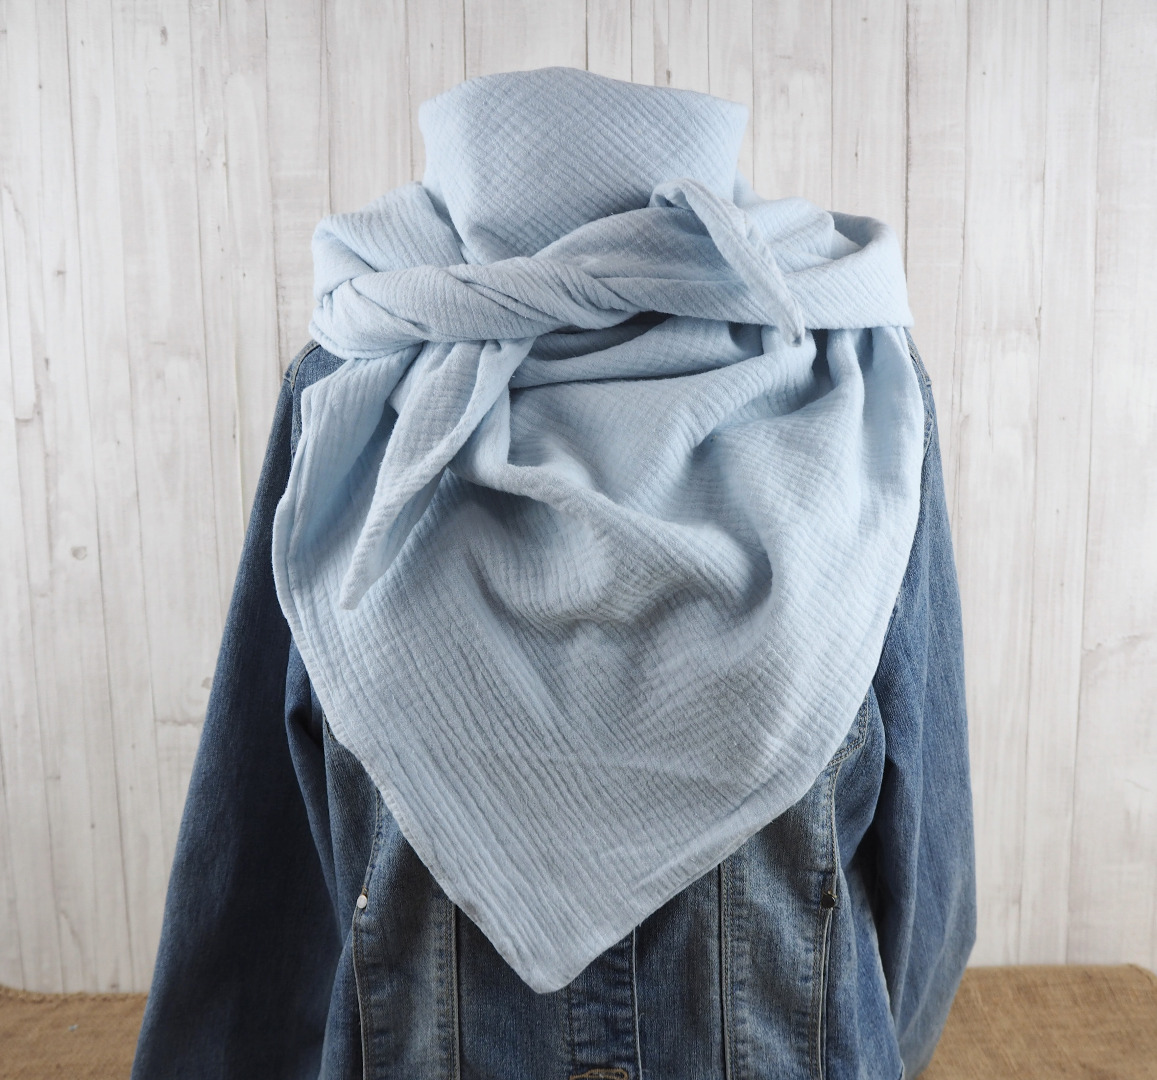 Tuch Dreieckstuch Musselin Damen Schal eisblau